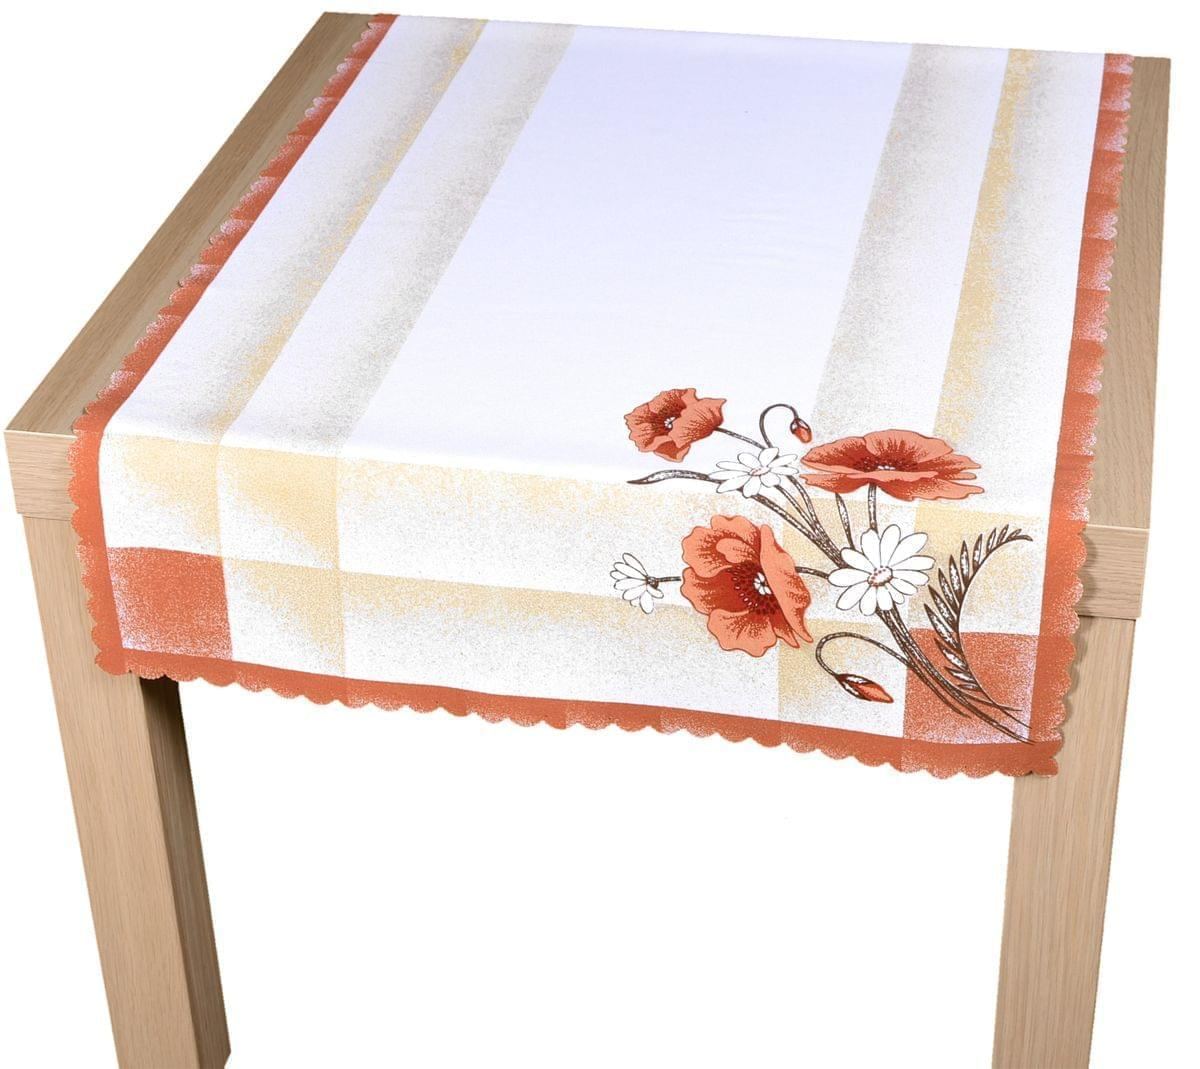 Forbyt, Ubrus, Máky, teracota s bílým, 50 x 100 cm